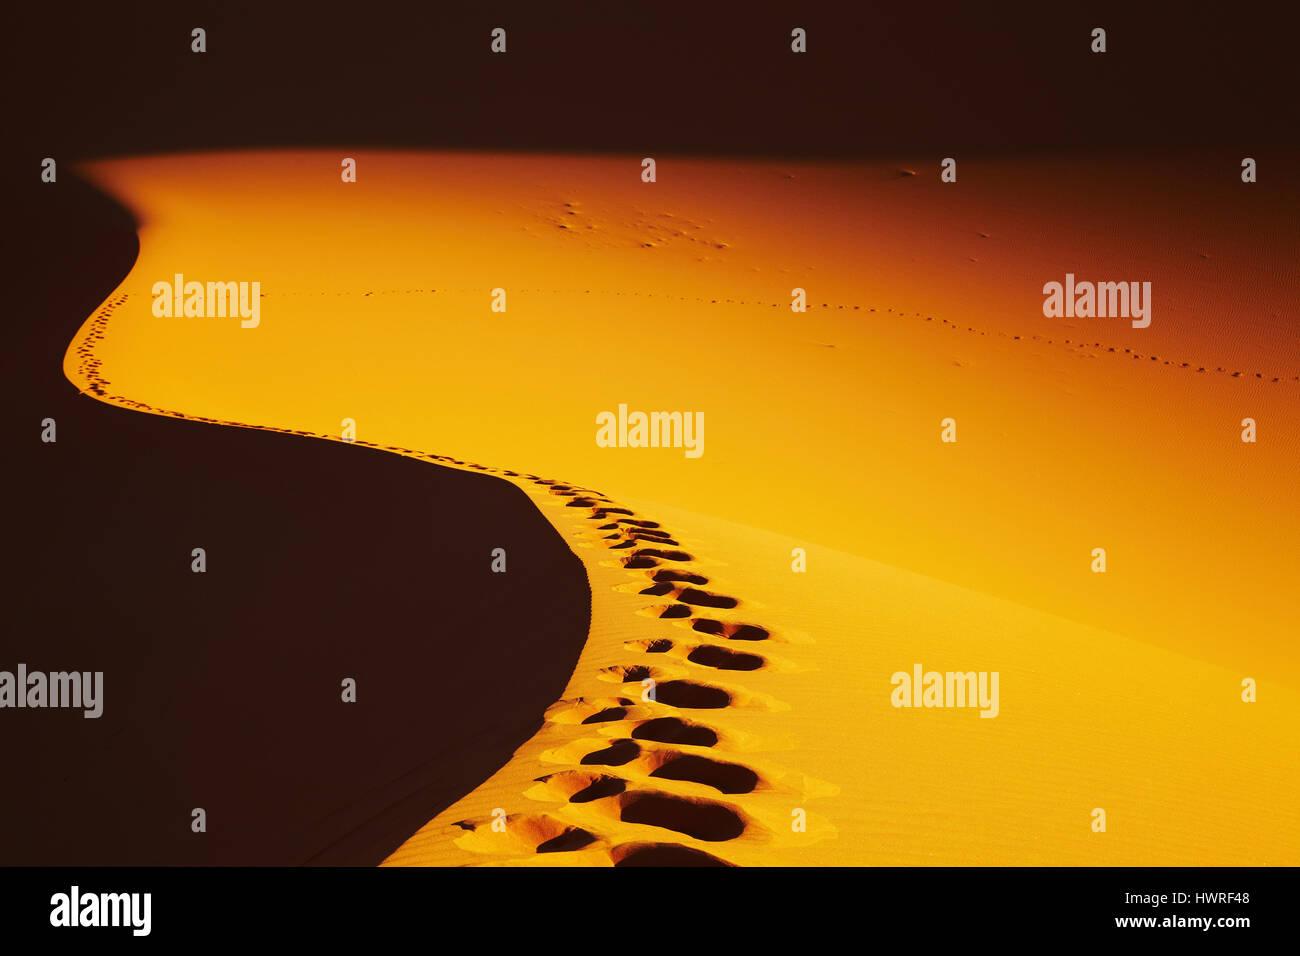 Footprints on sand dune, Sahara Desert, Algeria - Stock Image